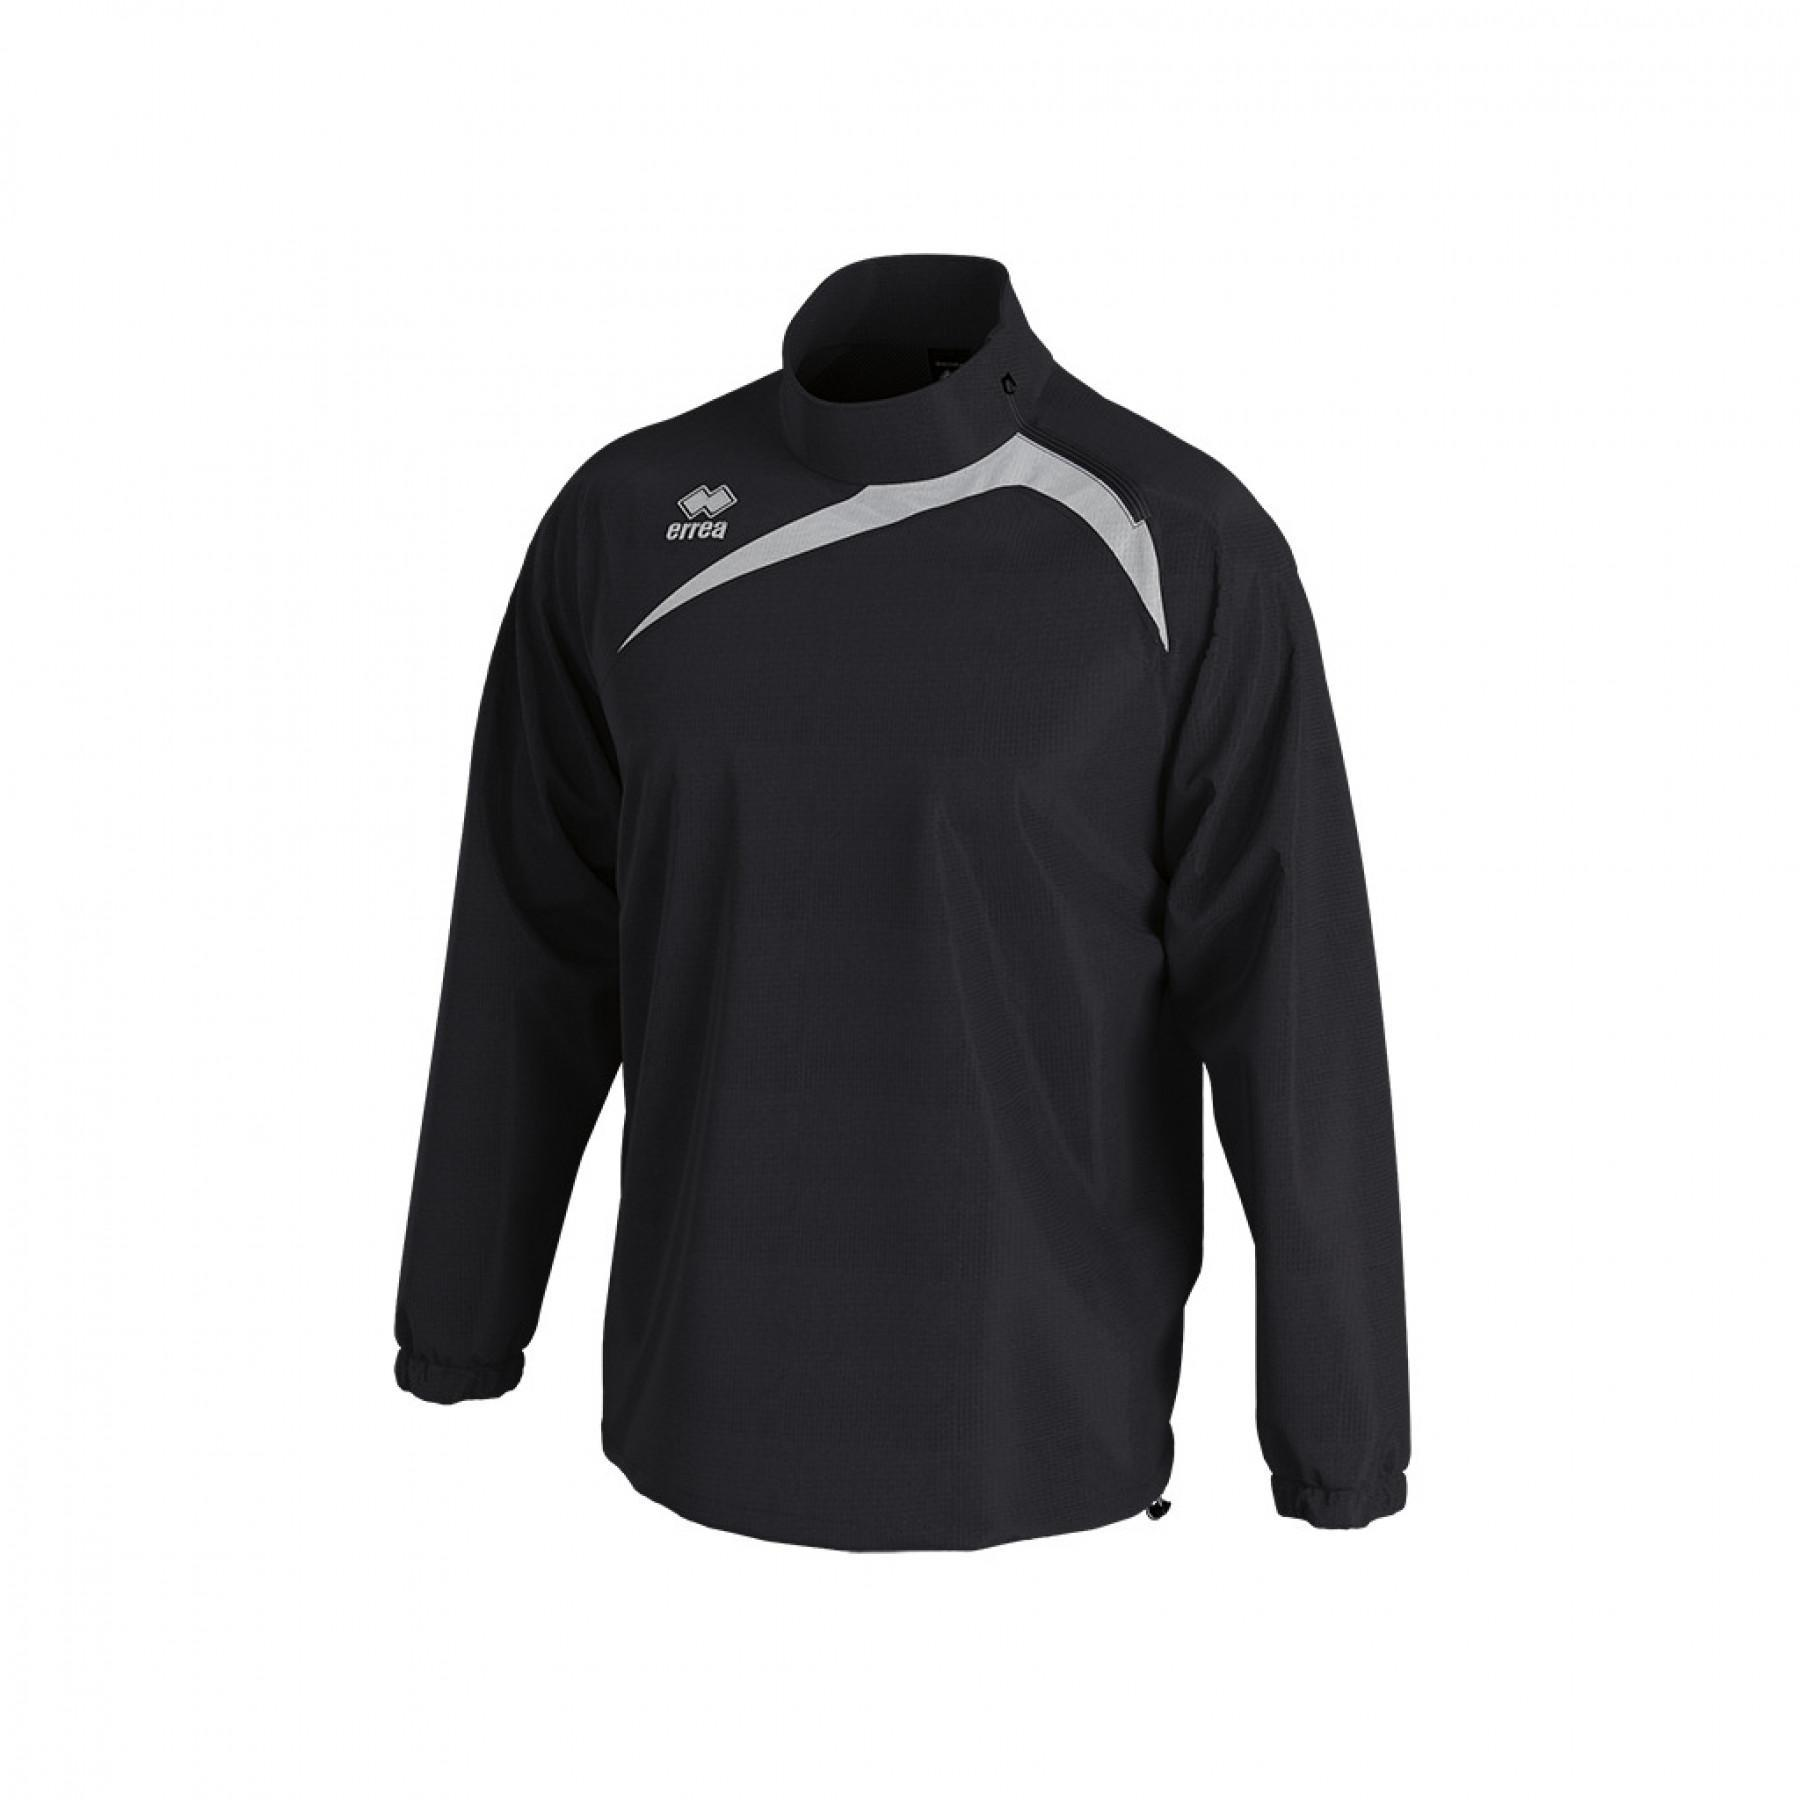 Jacket Errea edmonton 3.0